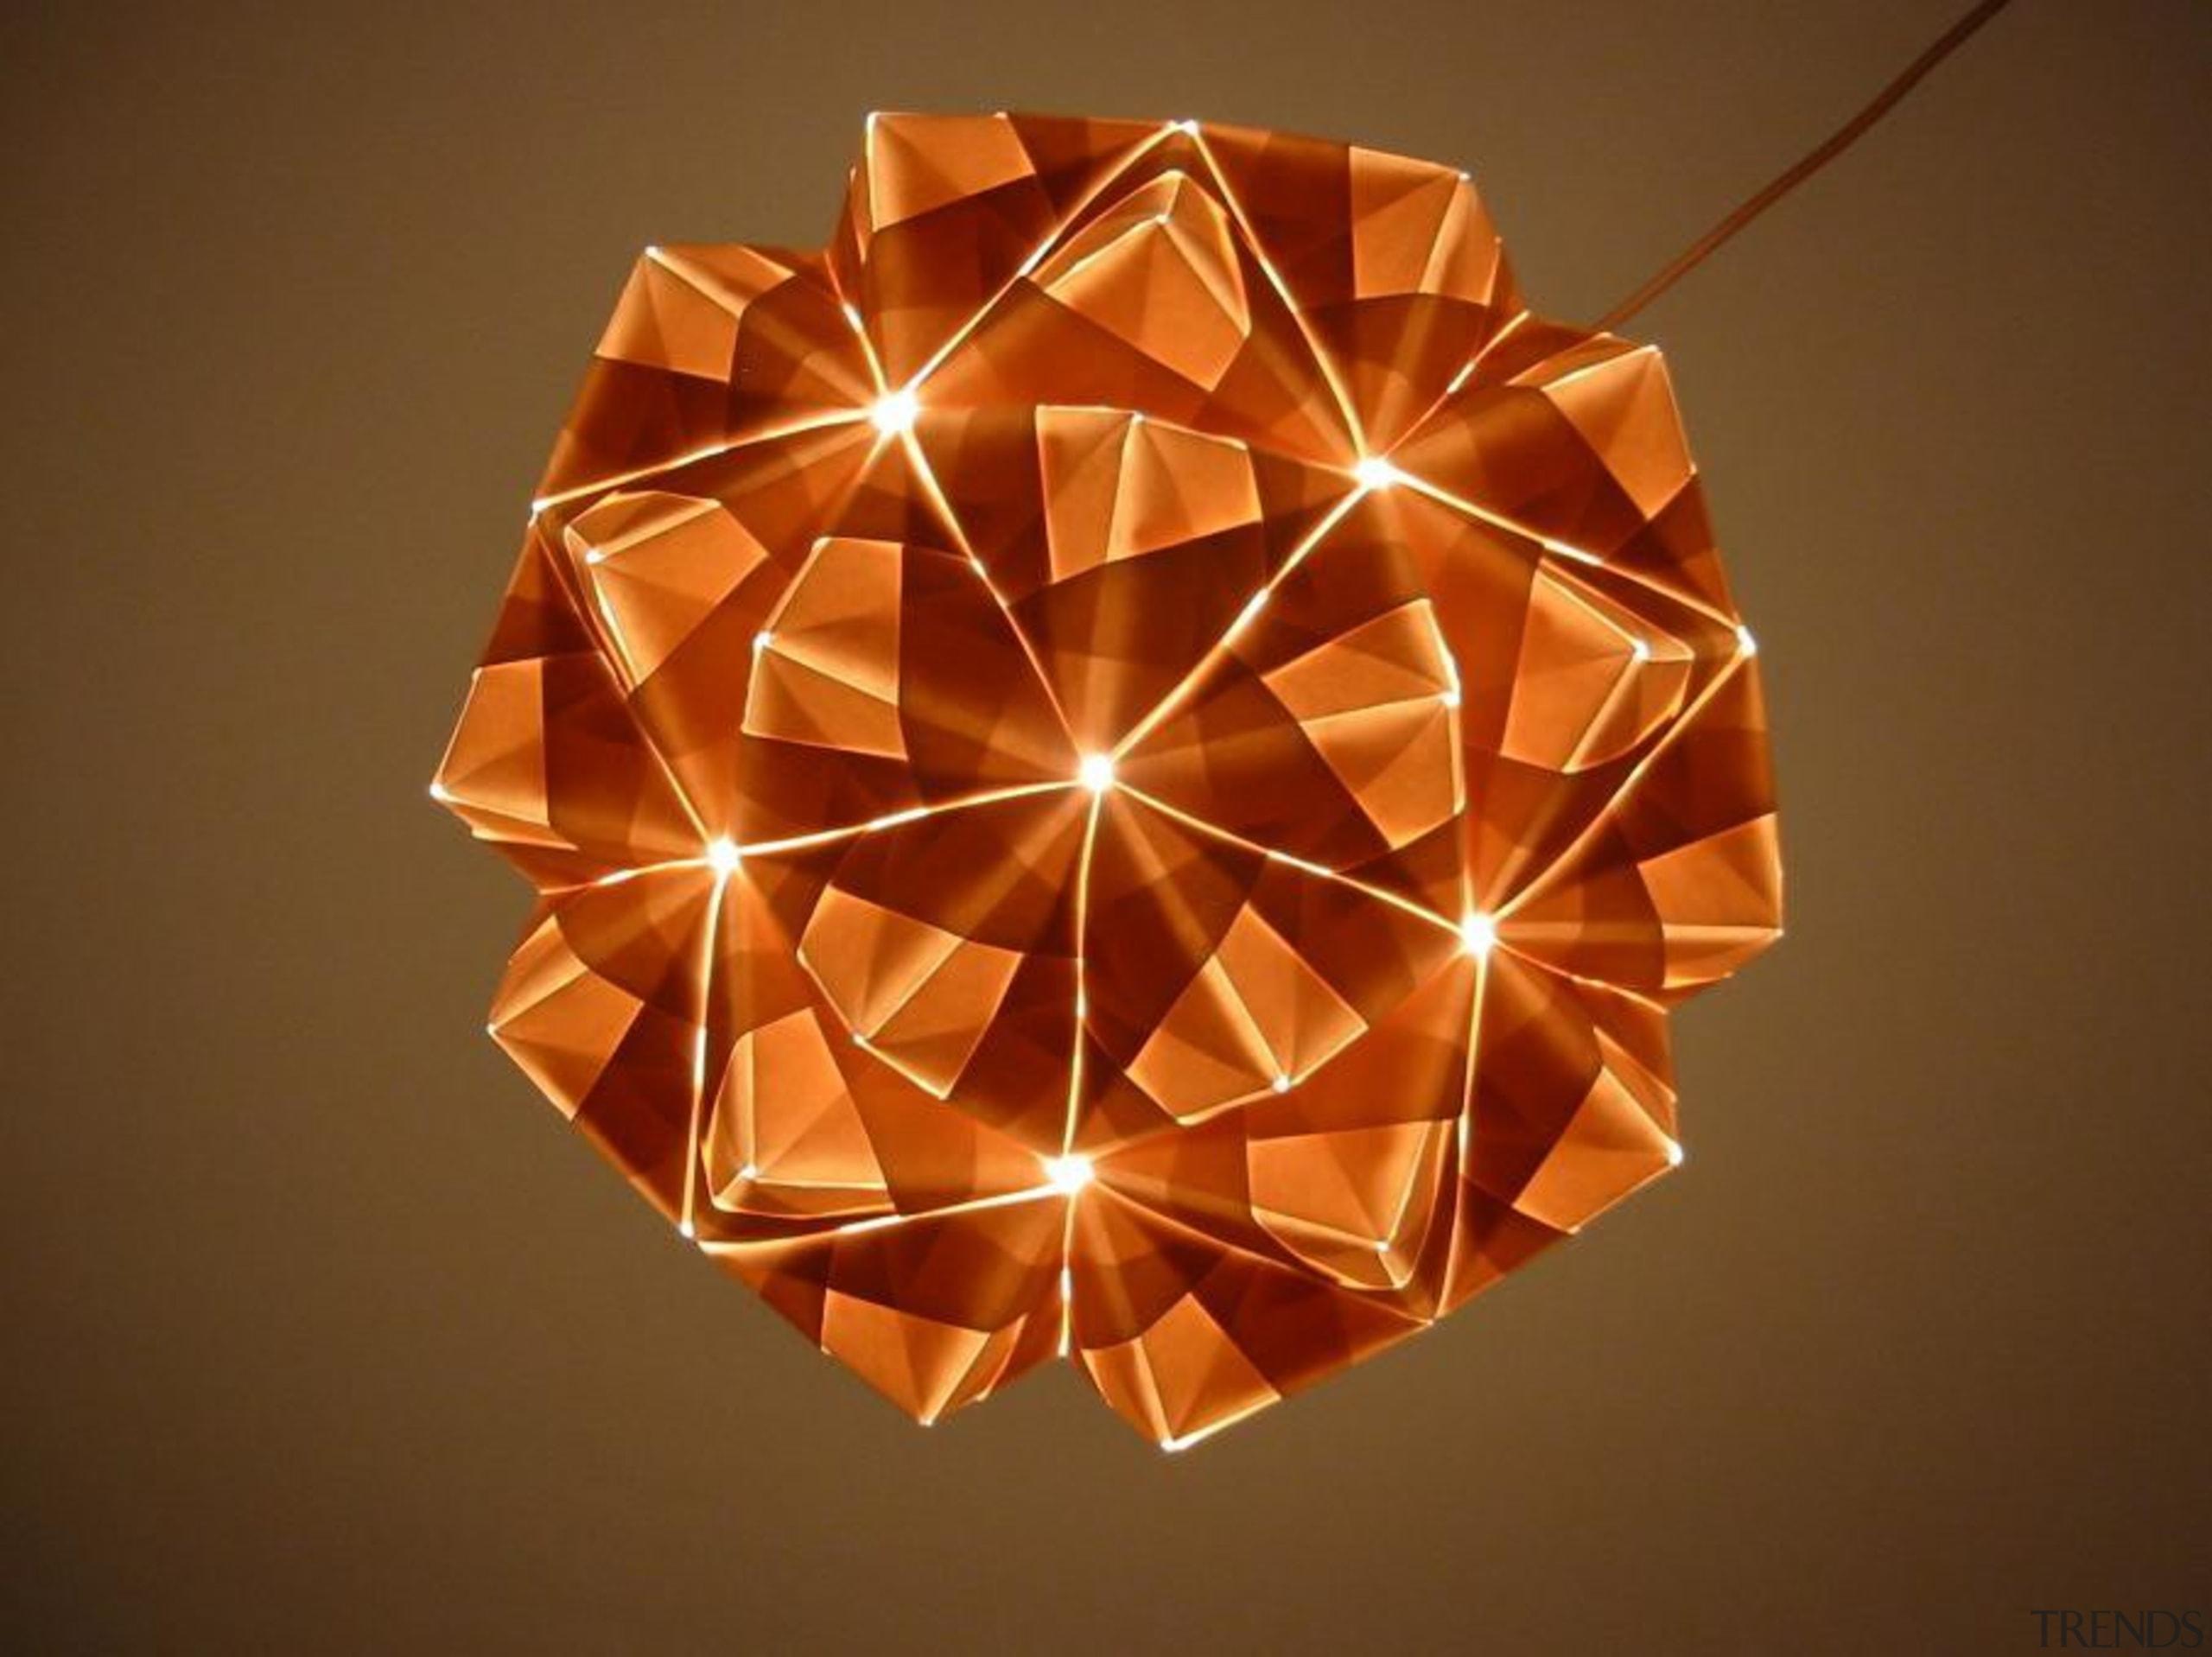 A range of folded metallic fabrics  are lampshade, light fixture, lighting, lighting accessory, origami, symmetry, brown